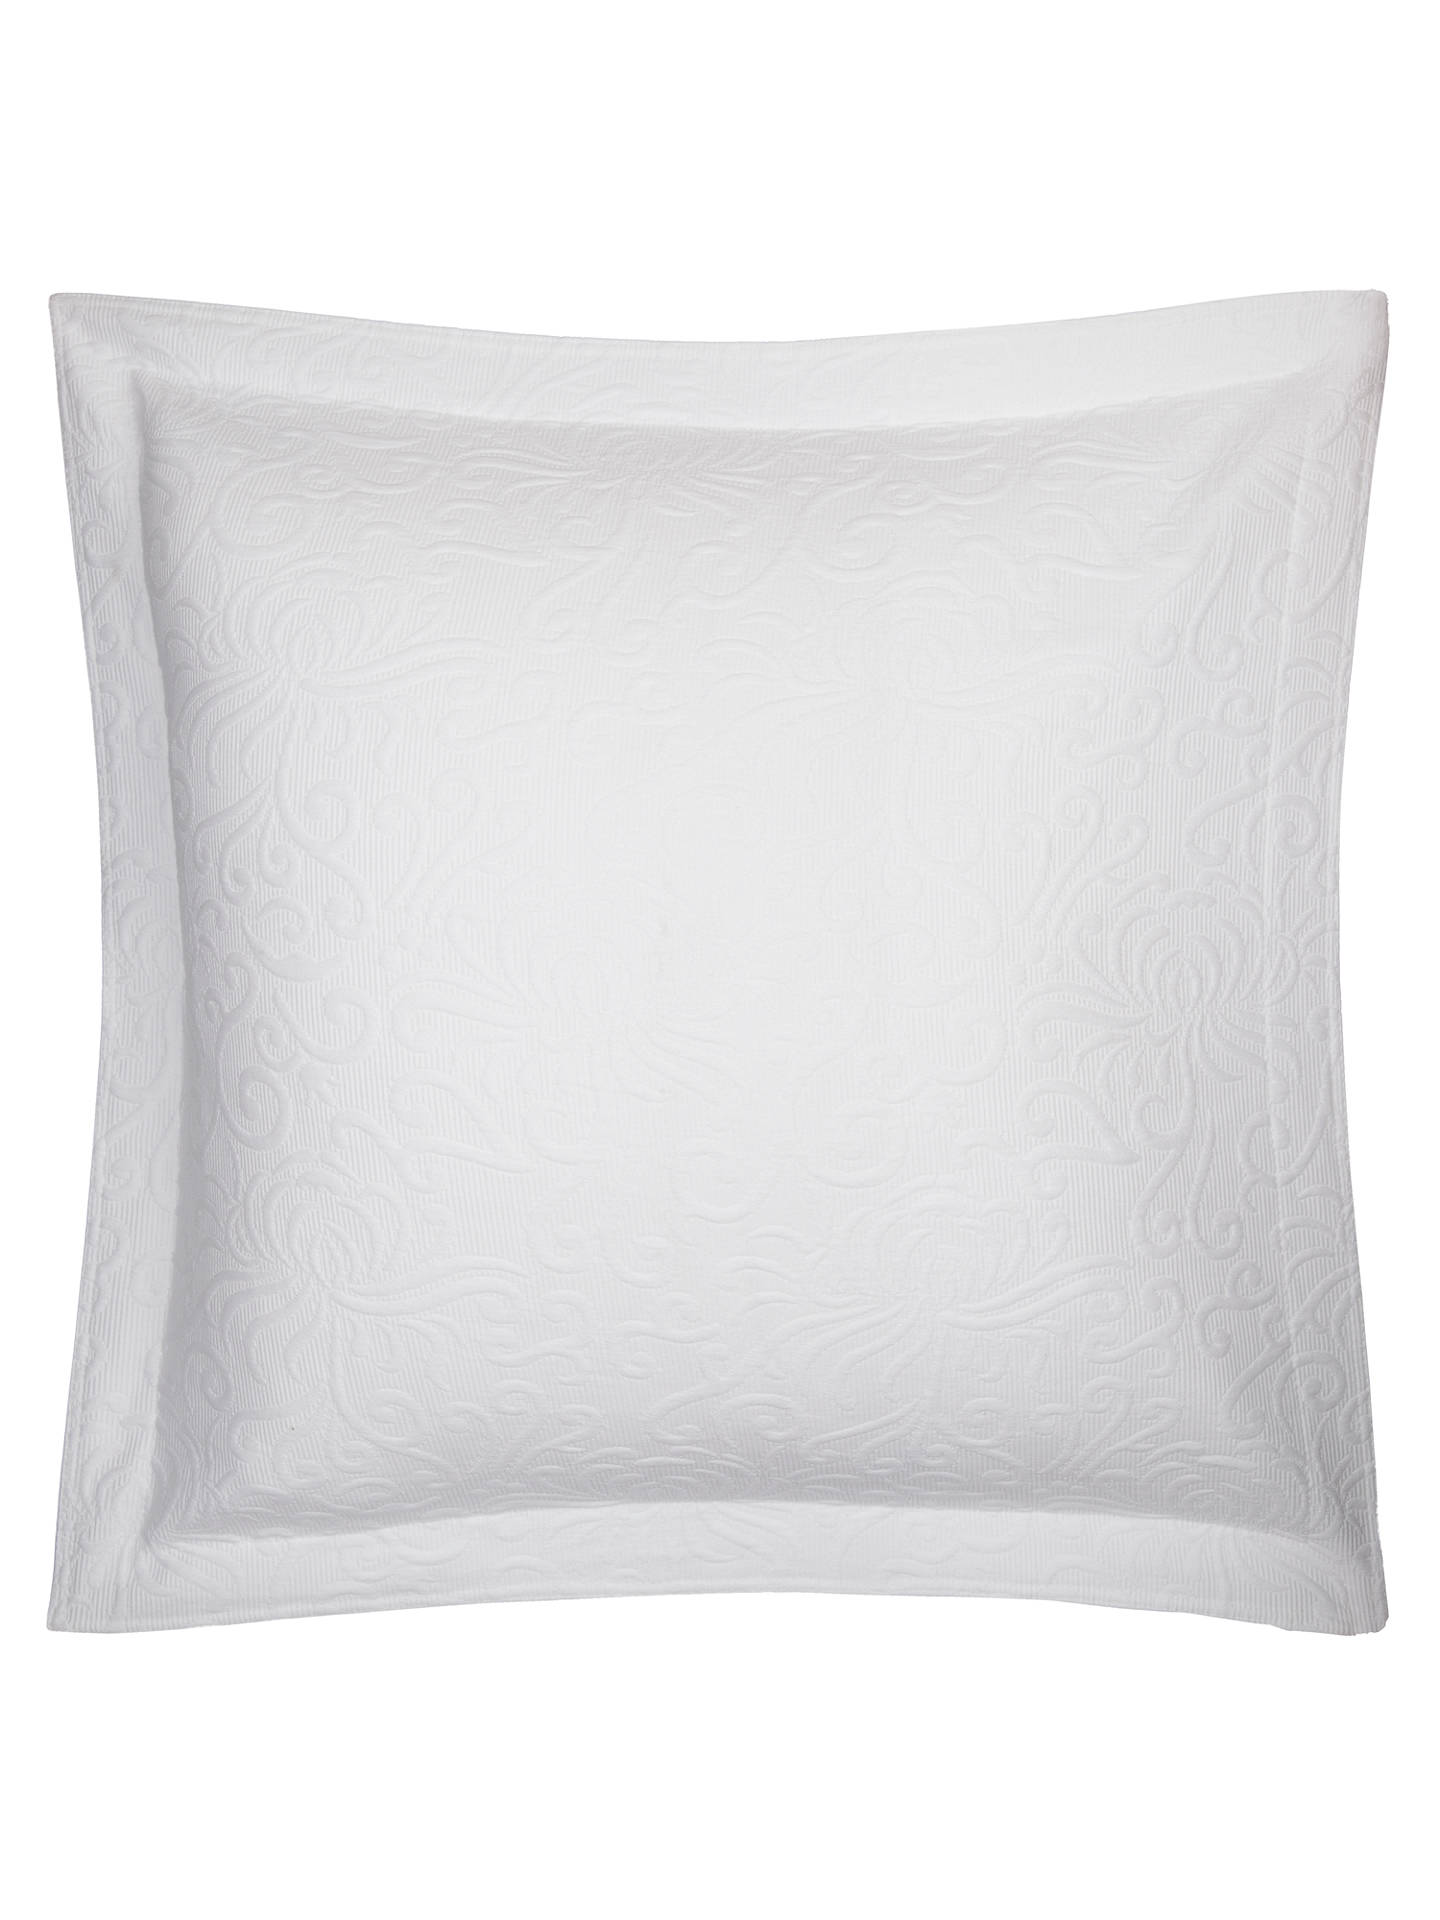 john lewis alice square oxford sham pillow cushion cover. Black Bedroom Furniture Sets. Home Design Ideas